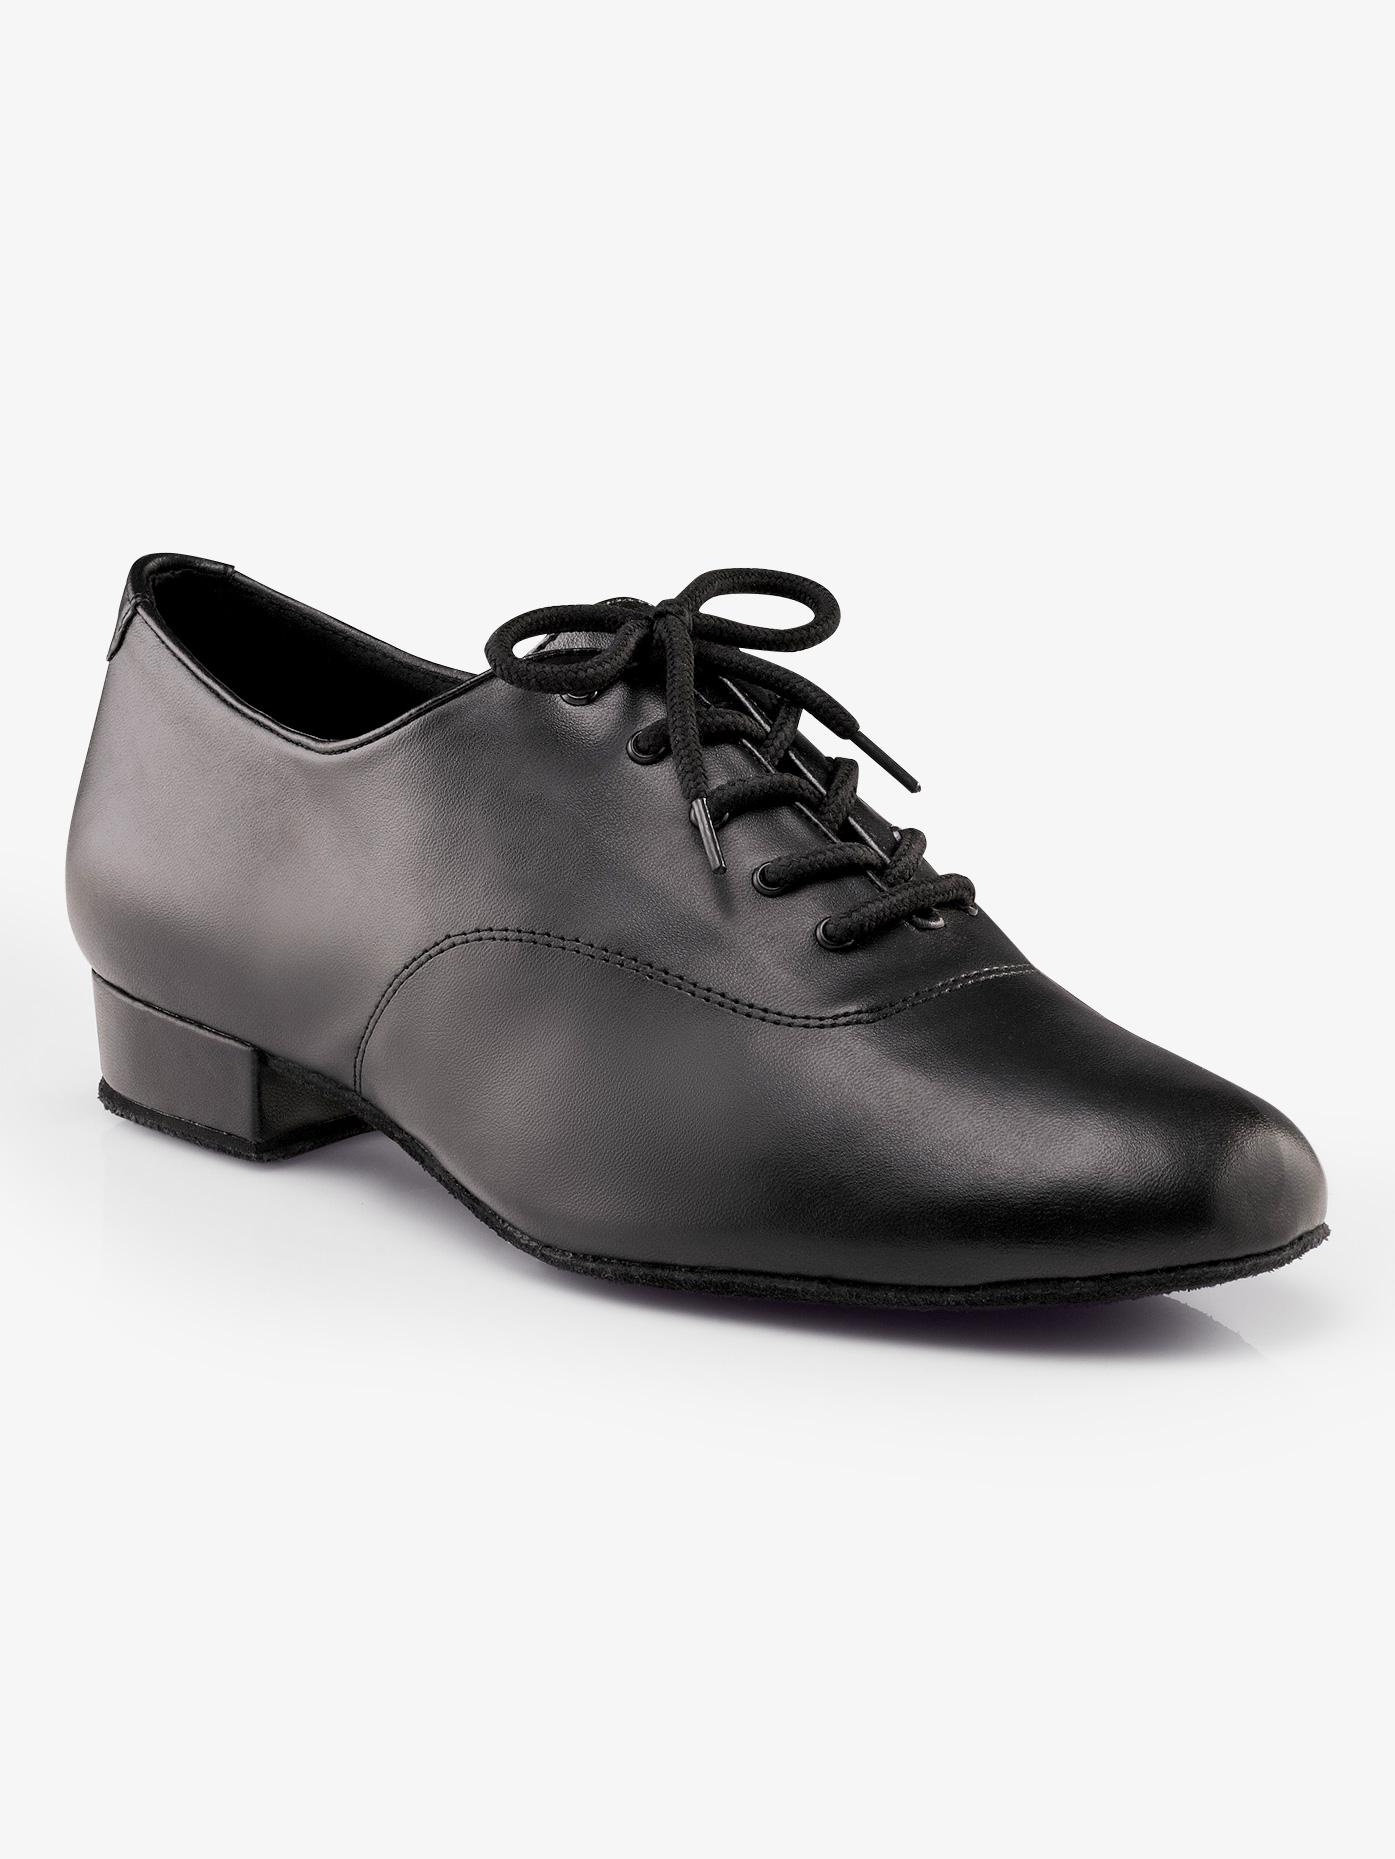 Capezio Mens Standard Social Dance Ballroom Shoes SD103